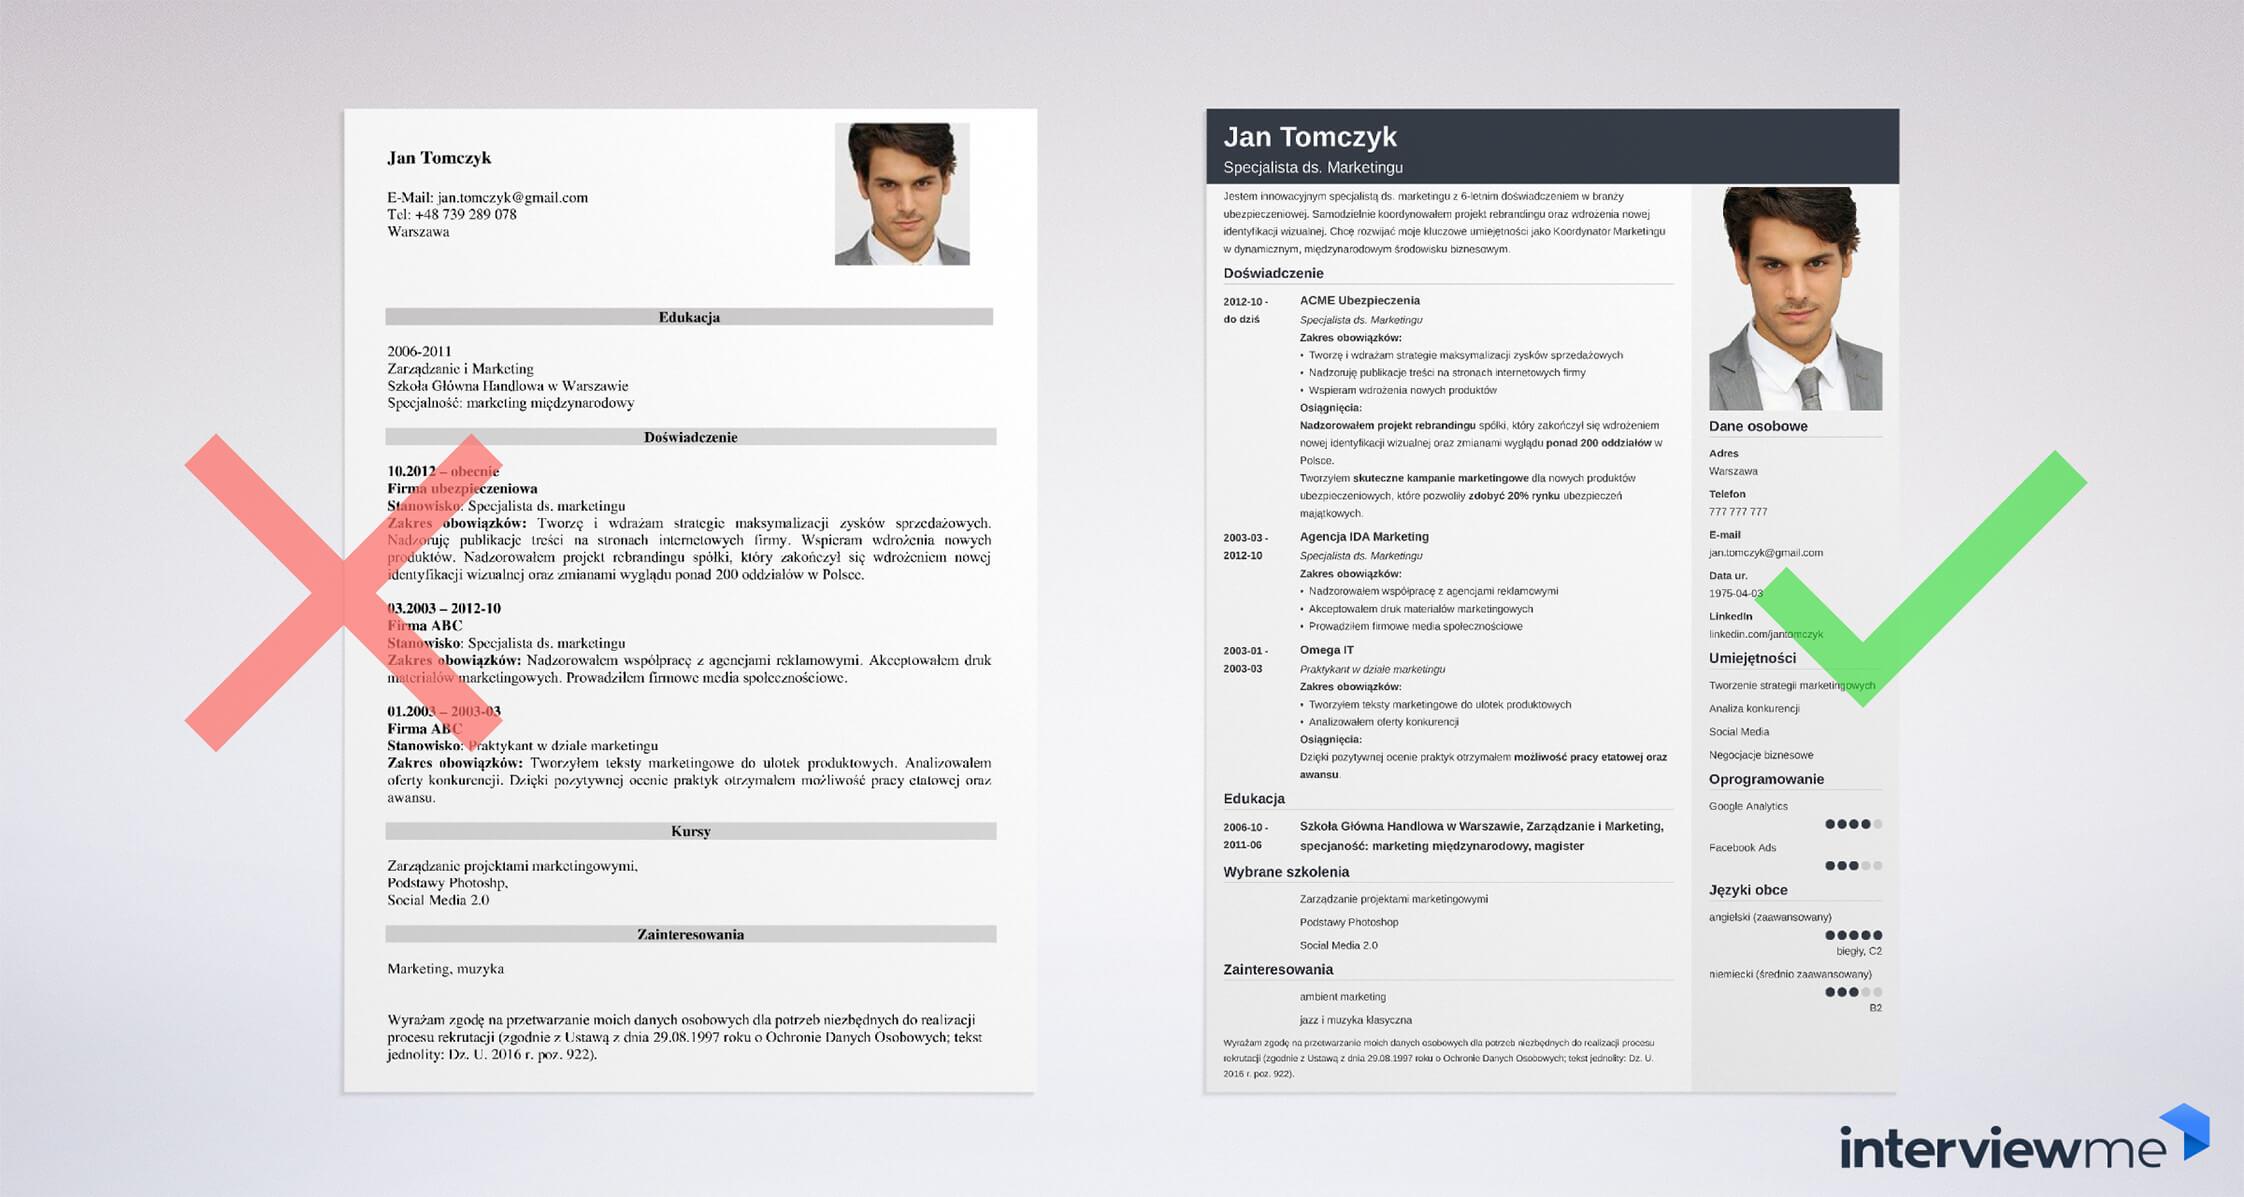 Stwórz swoje CV teraz.